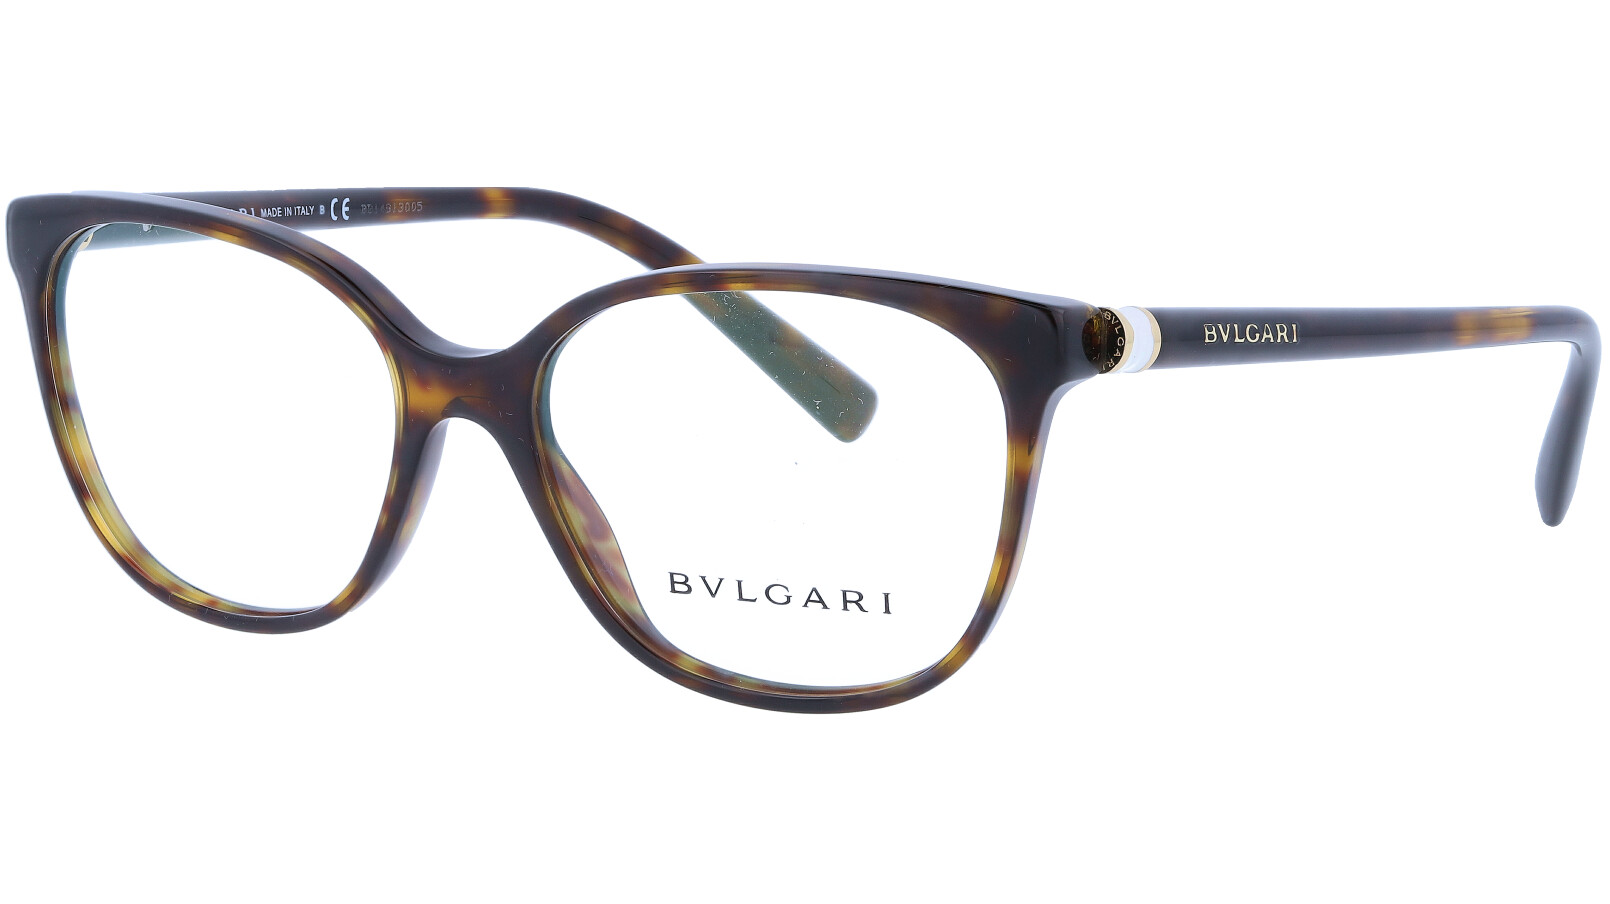 BVLGARI BV4129 504 54  HAVANA Glasses